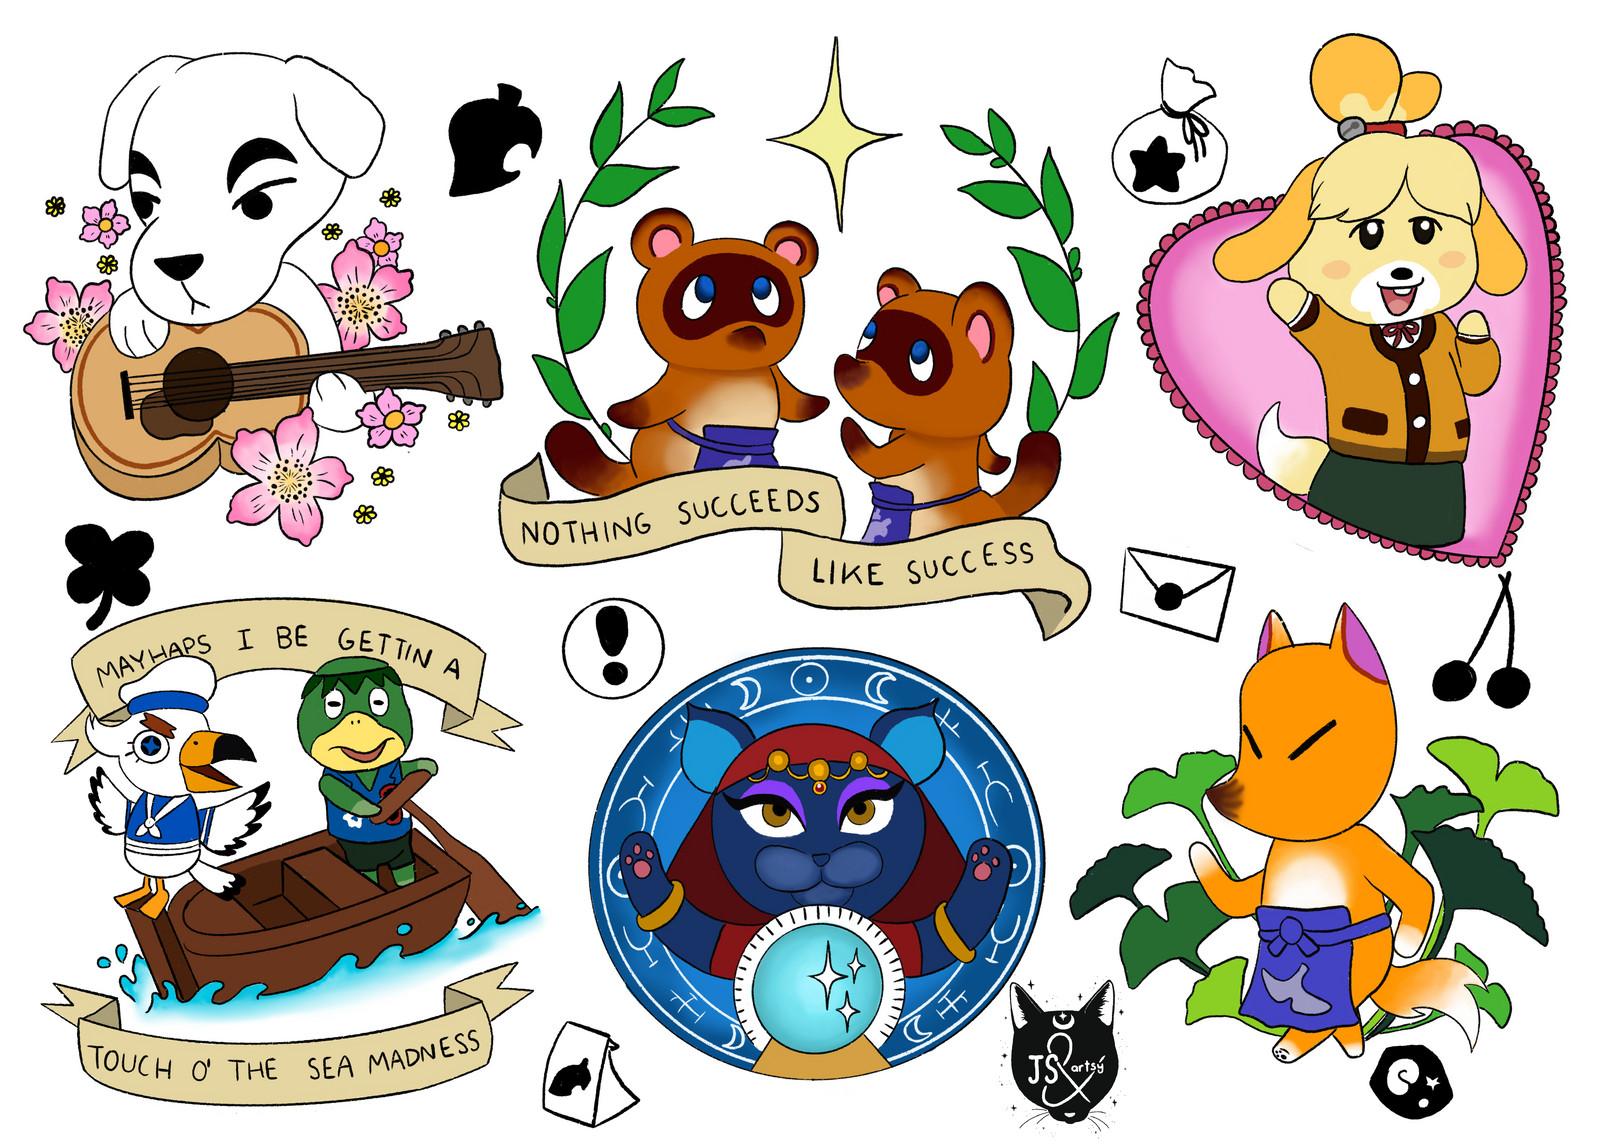 100 Photos of Animal Crossing Flash